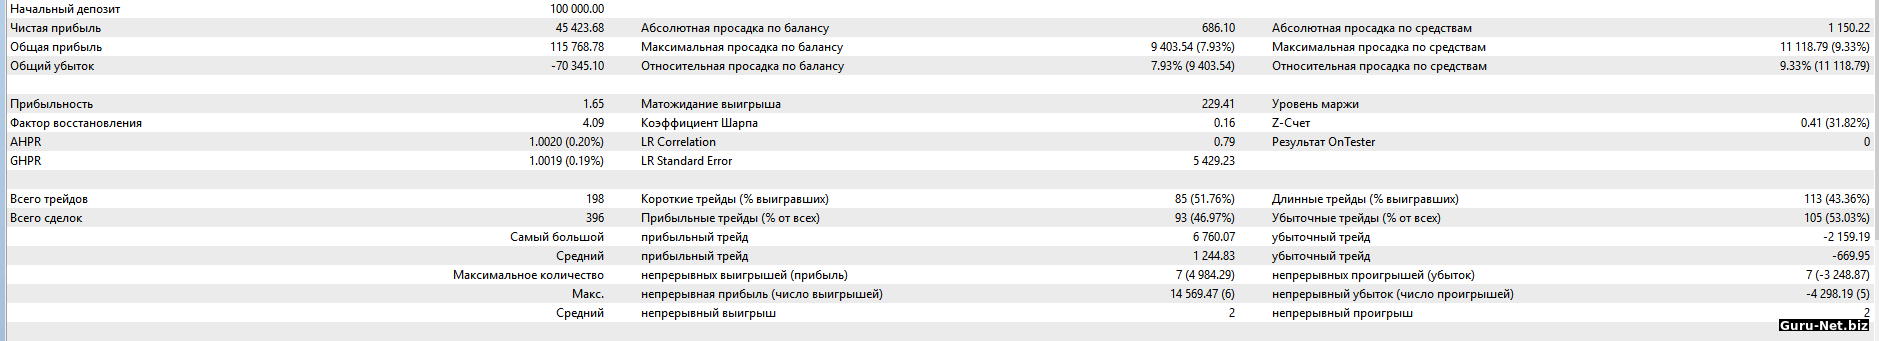 Статистика торговли робота PC с фильтром 2018 BR